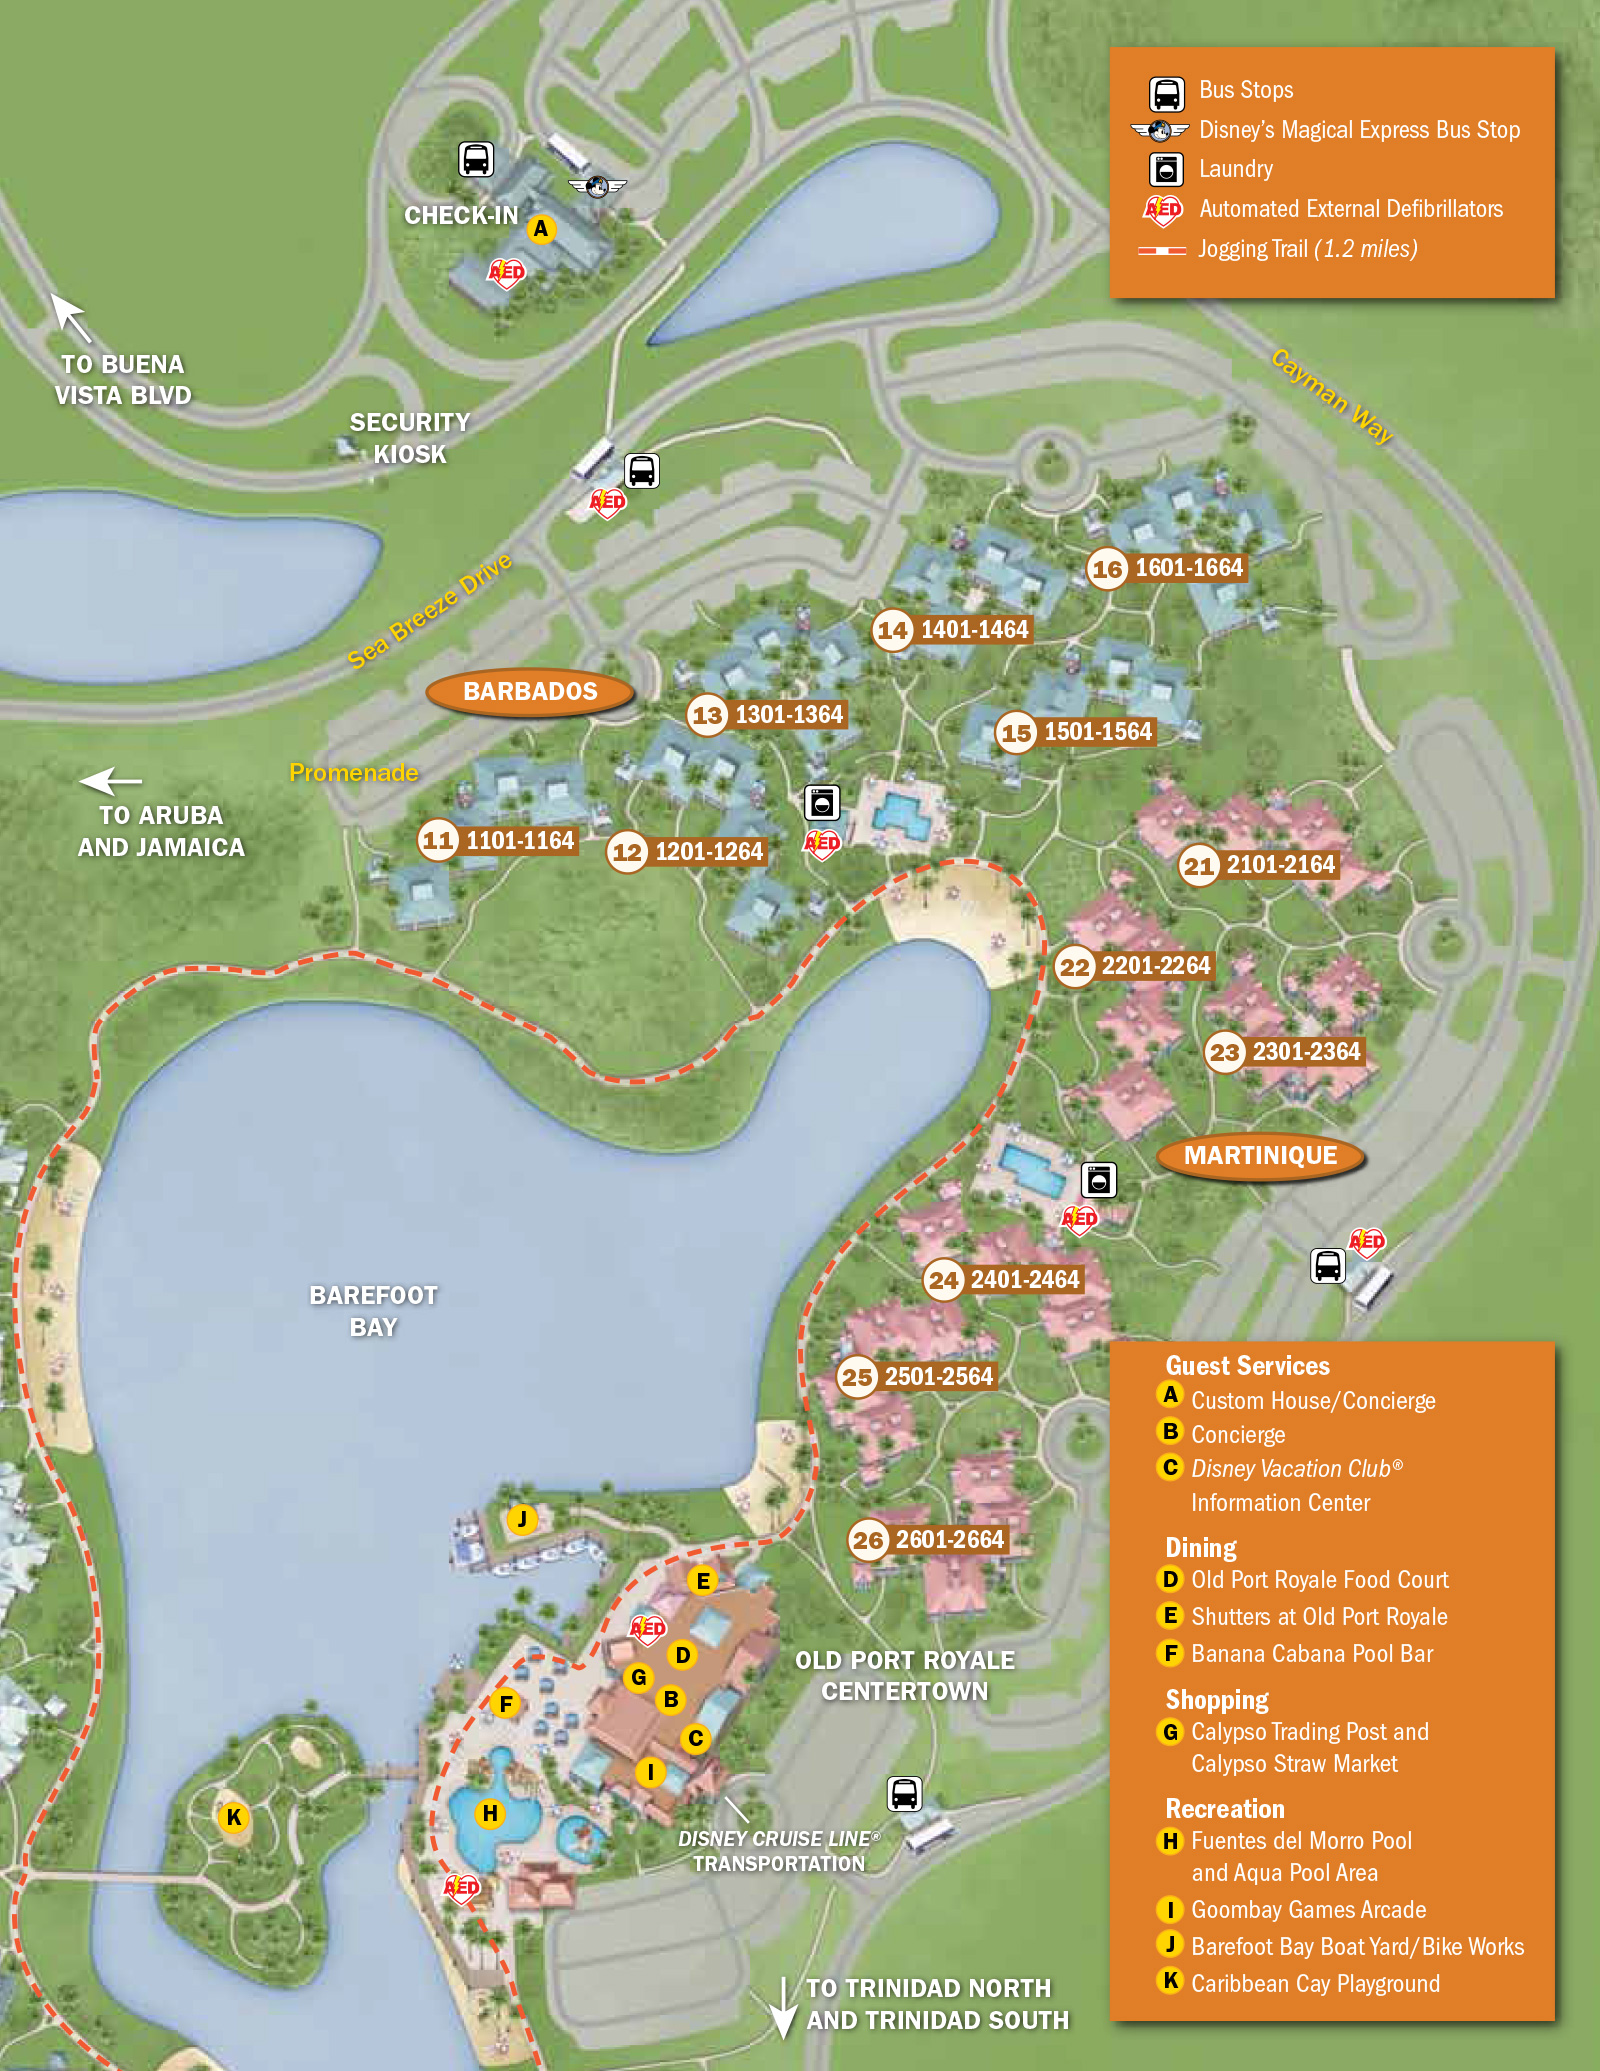 caribbean beach resort guide map.  caribbean beach resort guide map  photo  of